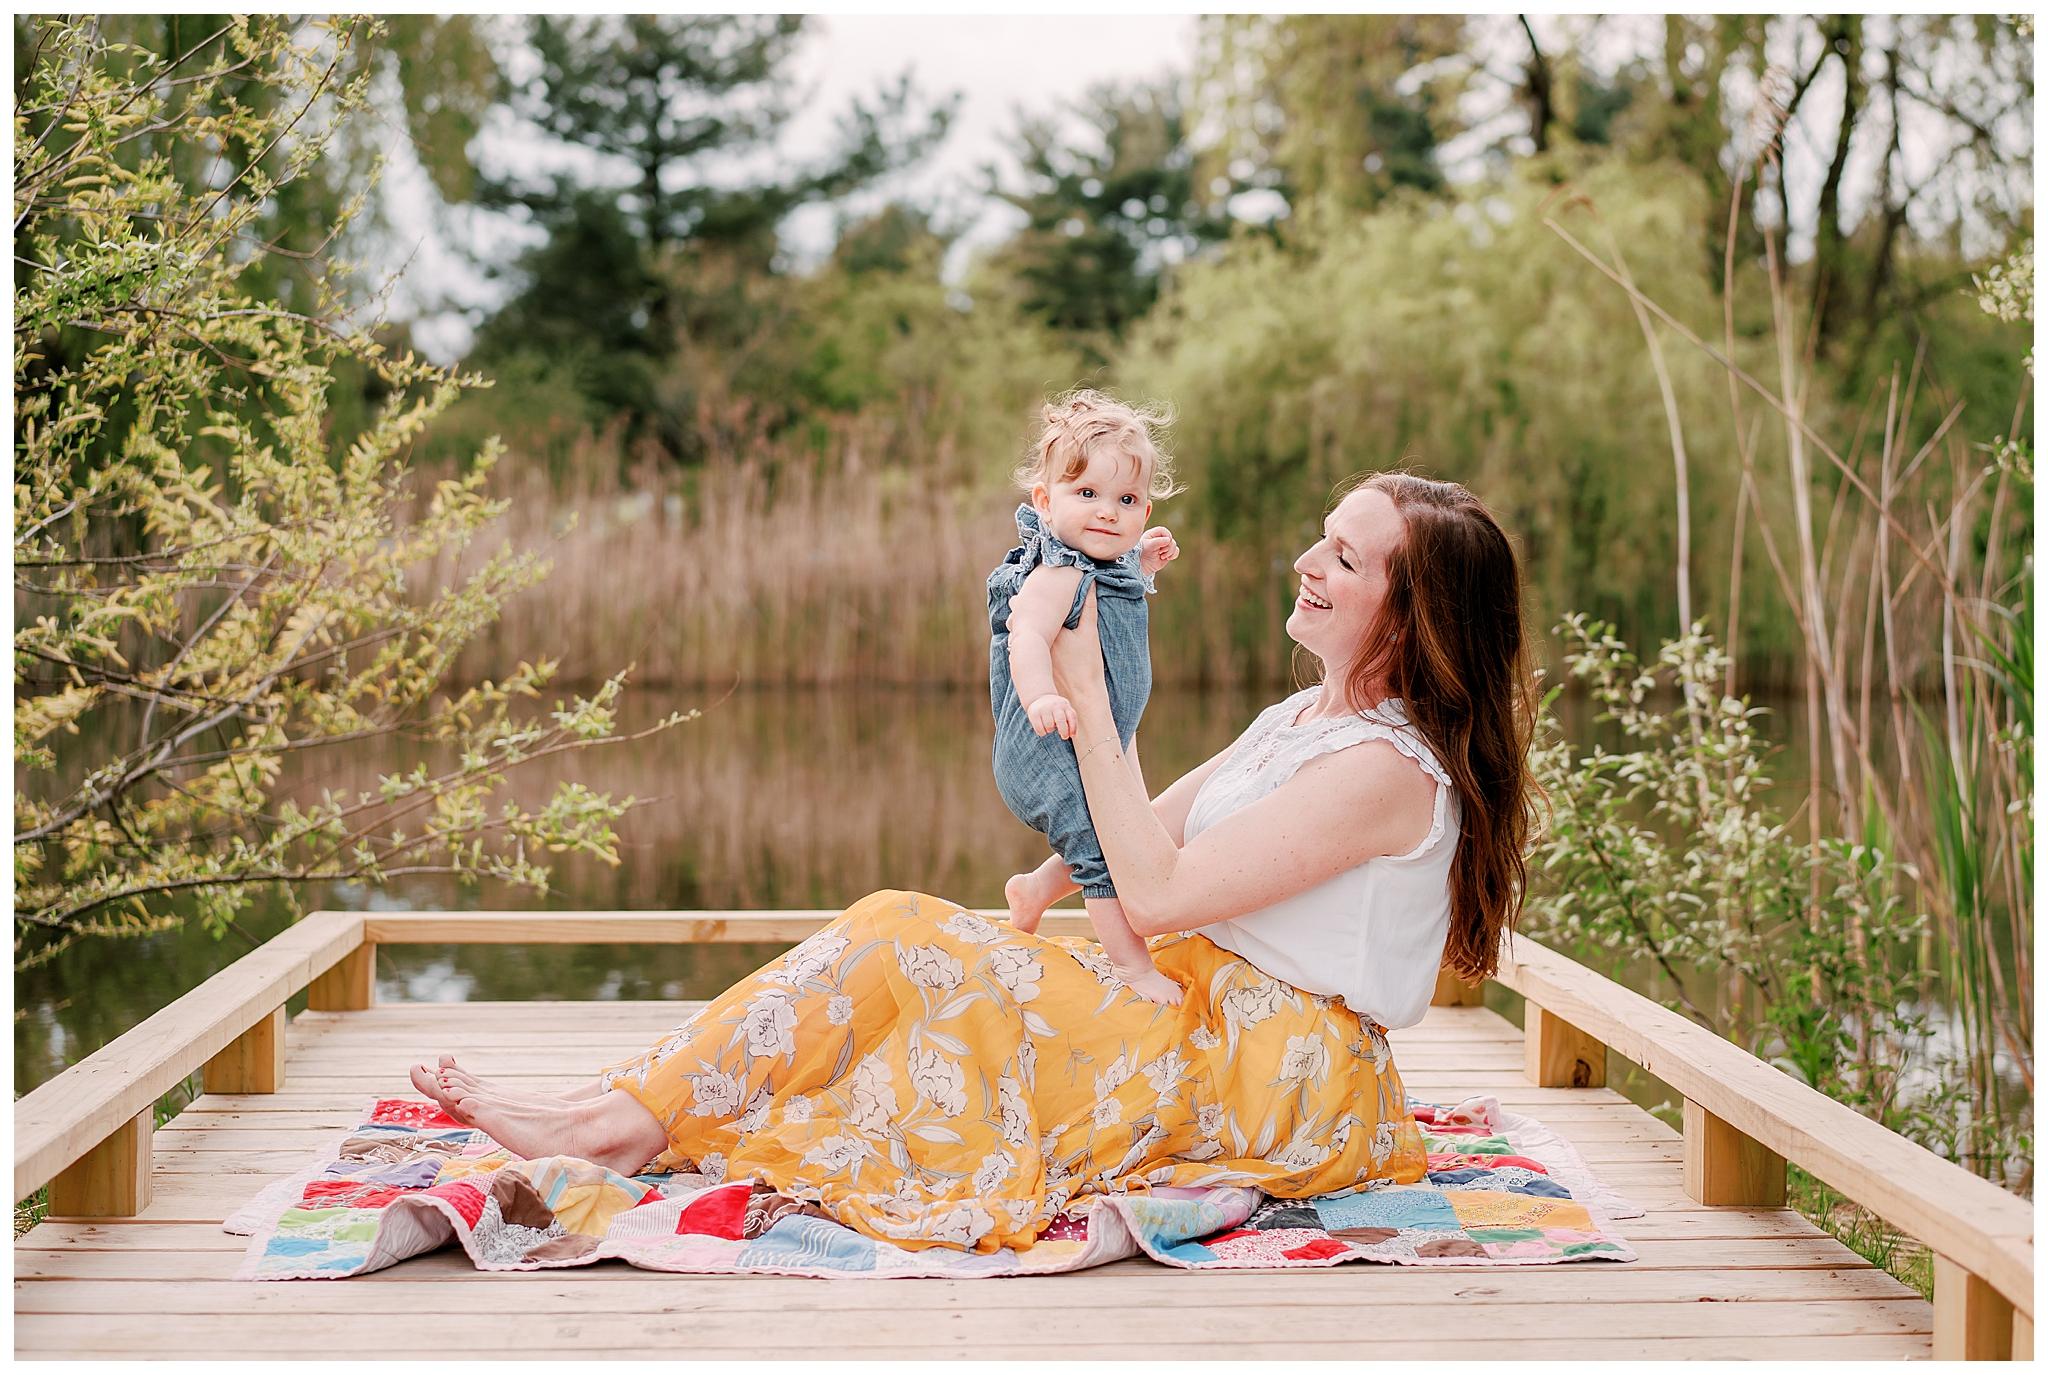 AnneMarie_Hamant_family_photographer_lehigh_valley_pa_0272.jpg